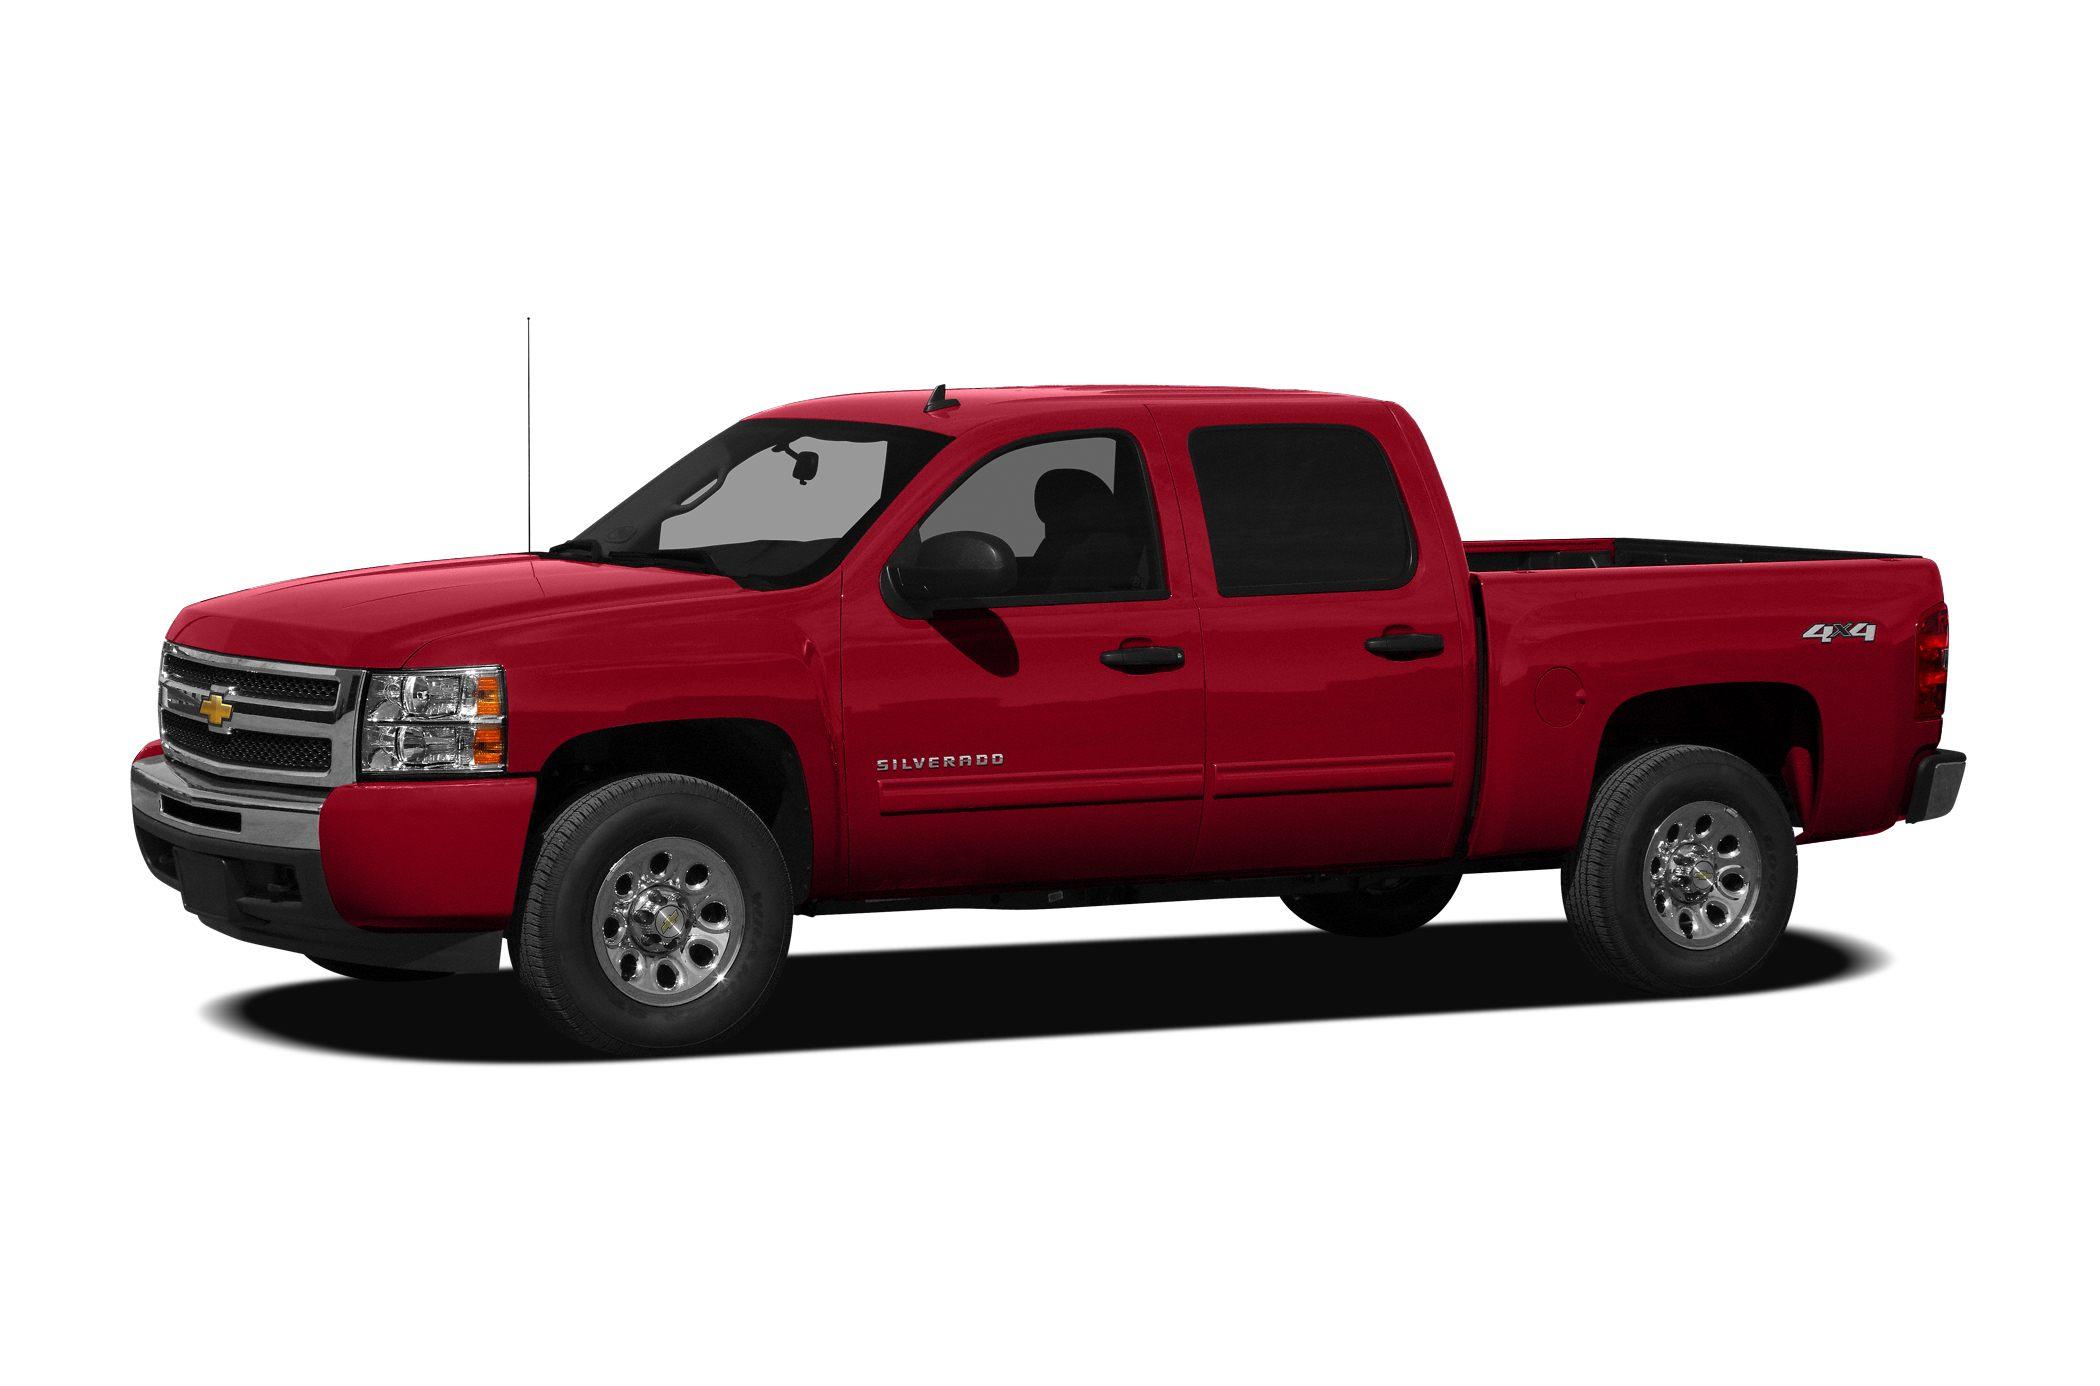 2010 Chevrolet Silverado 1500 LT Miles 120767Stock 1463 VIN 3GCRCSE01AG293908